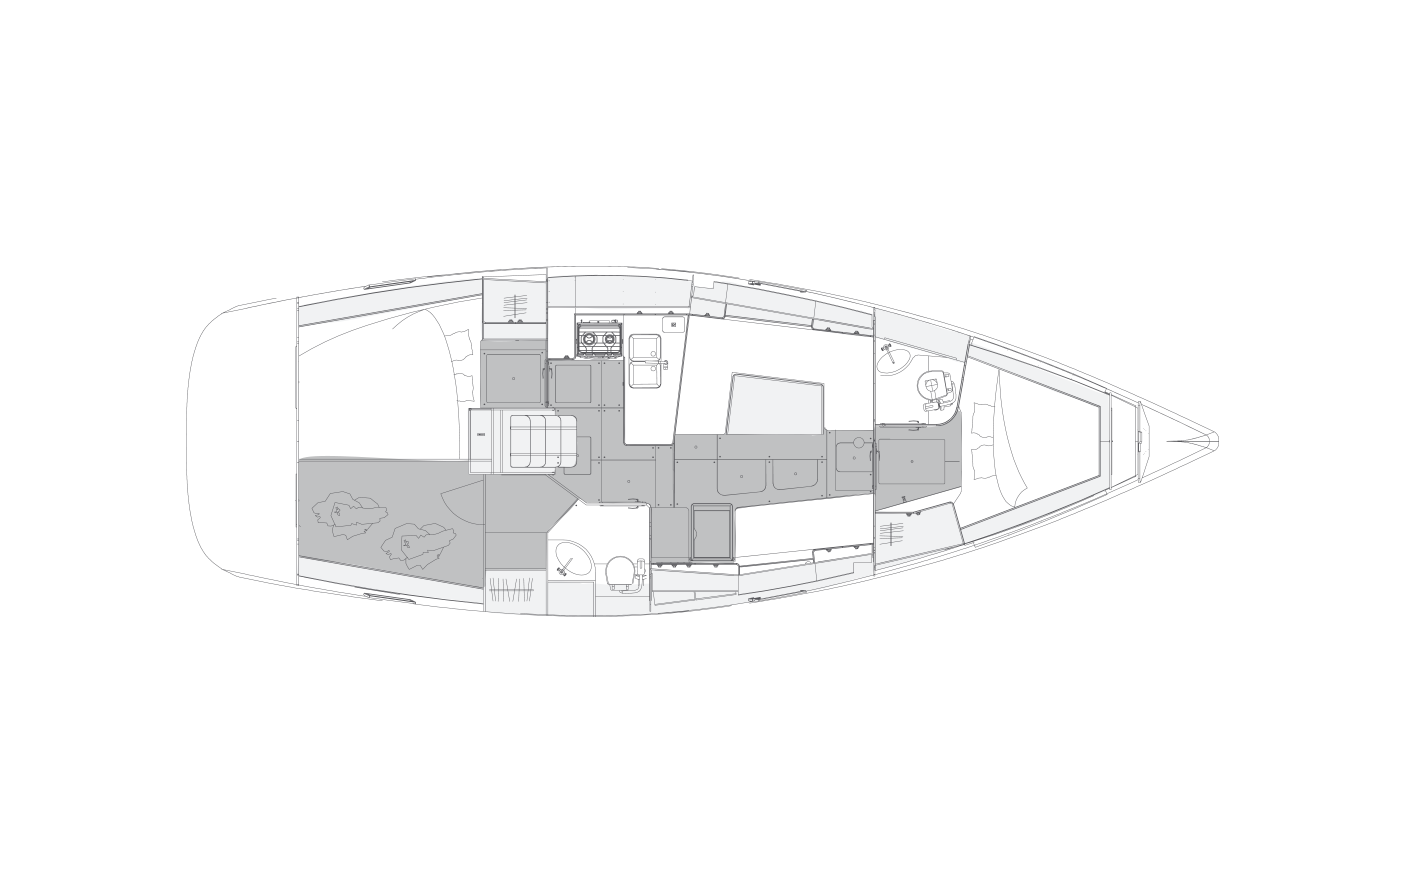 i40.1 - 2 cabins & 2 heads